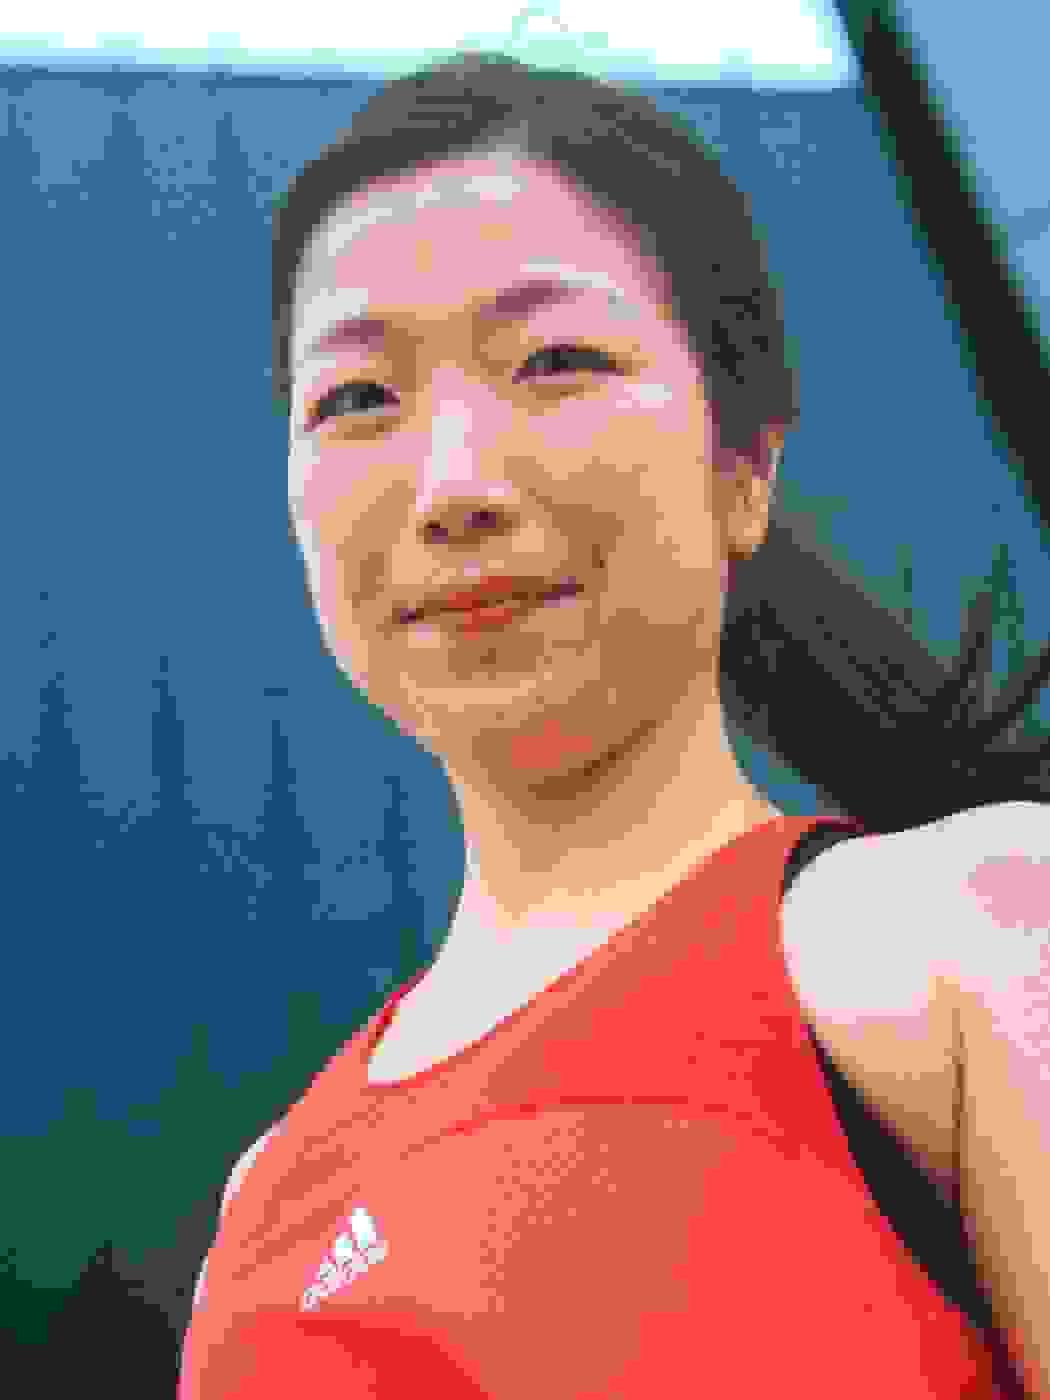 An image showing a portrait of Shoko Ota